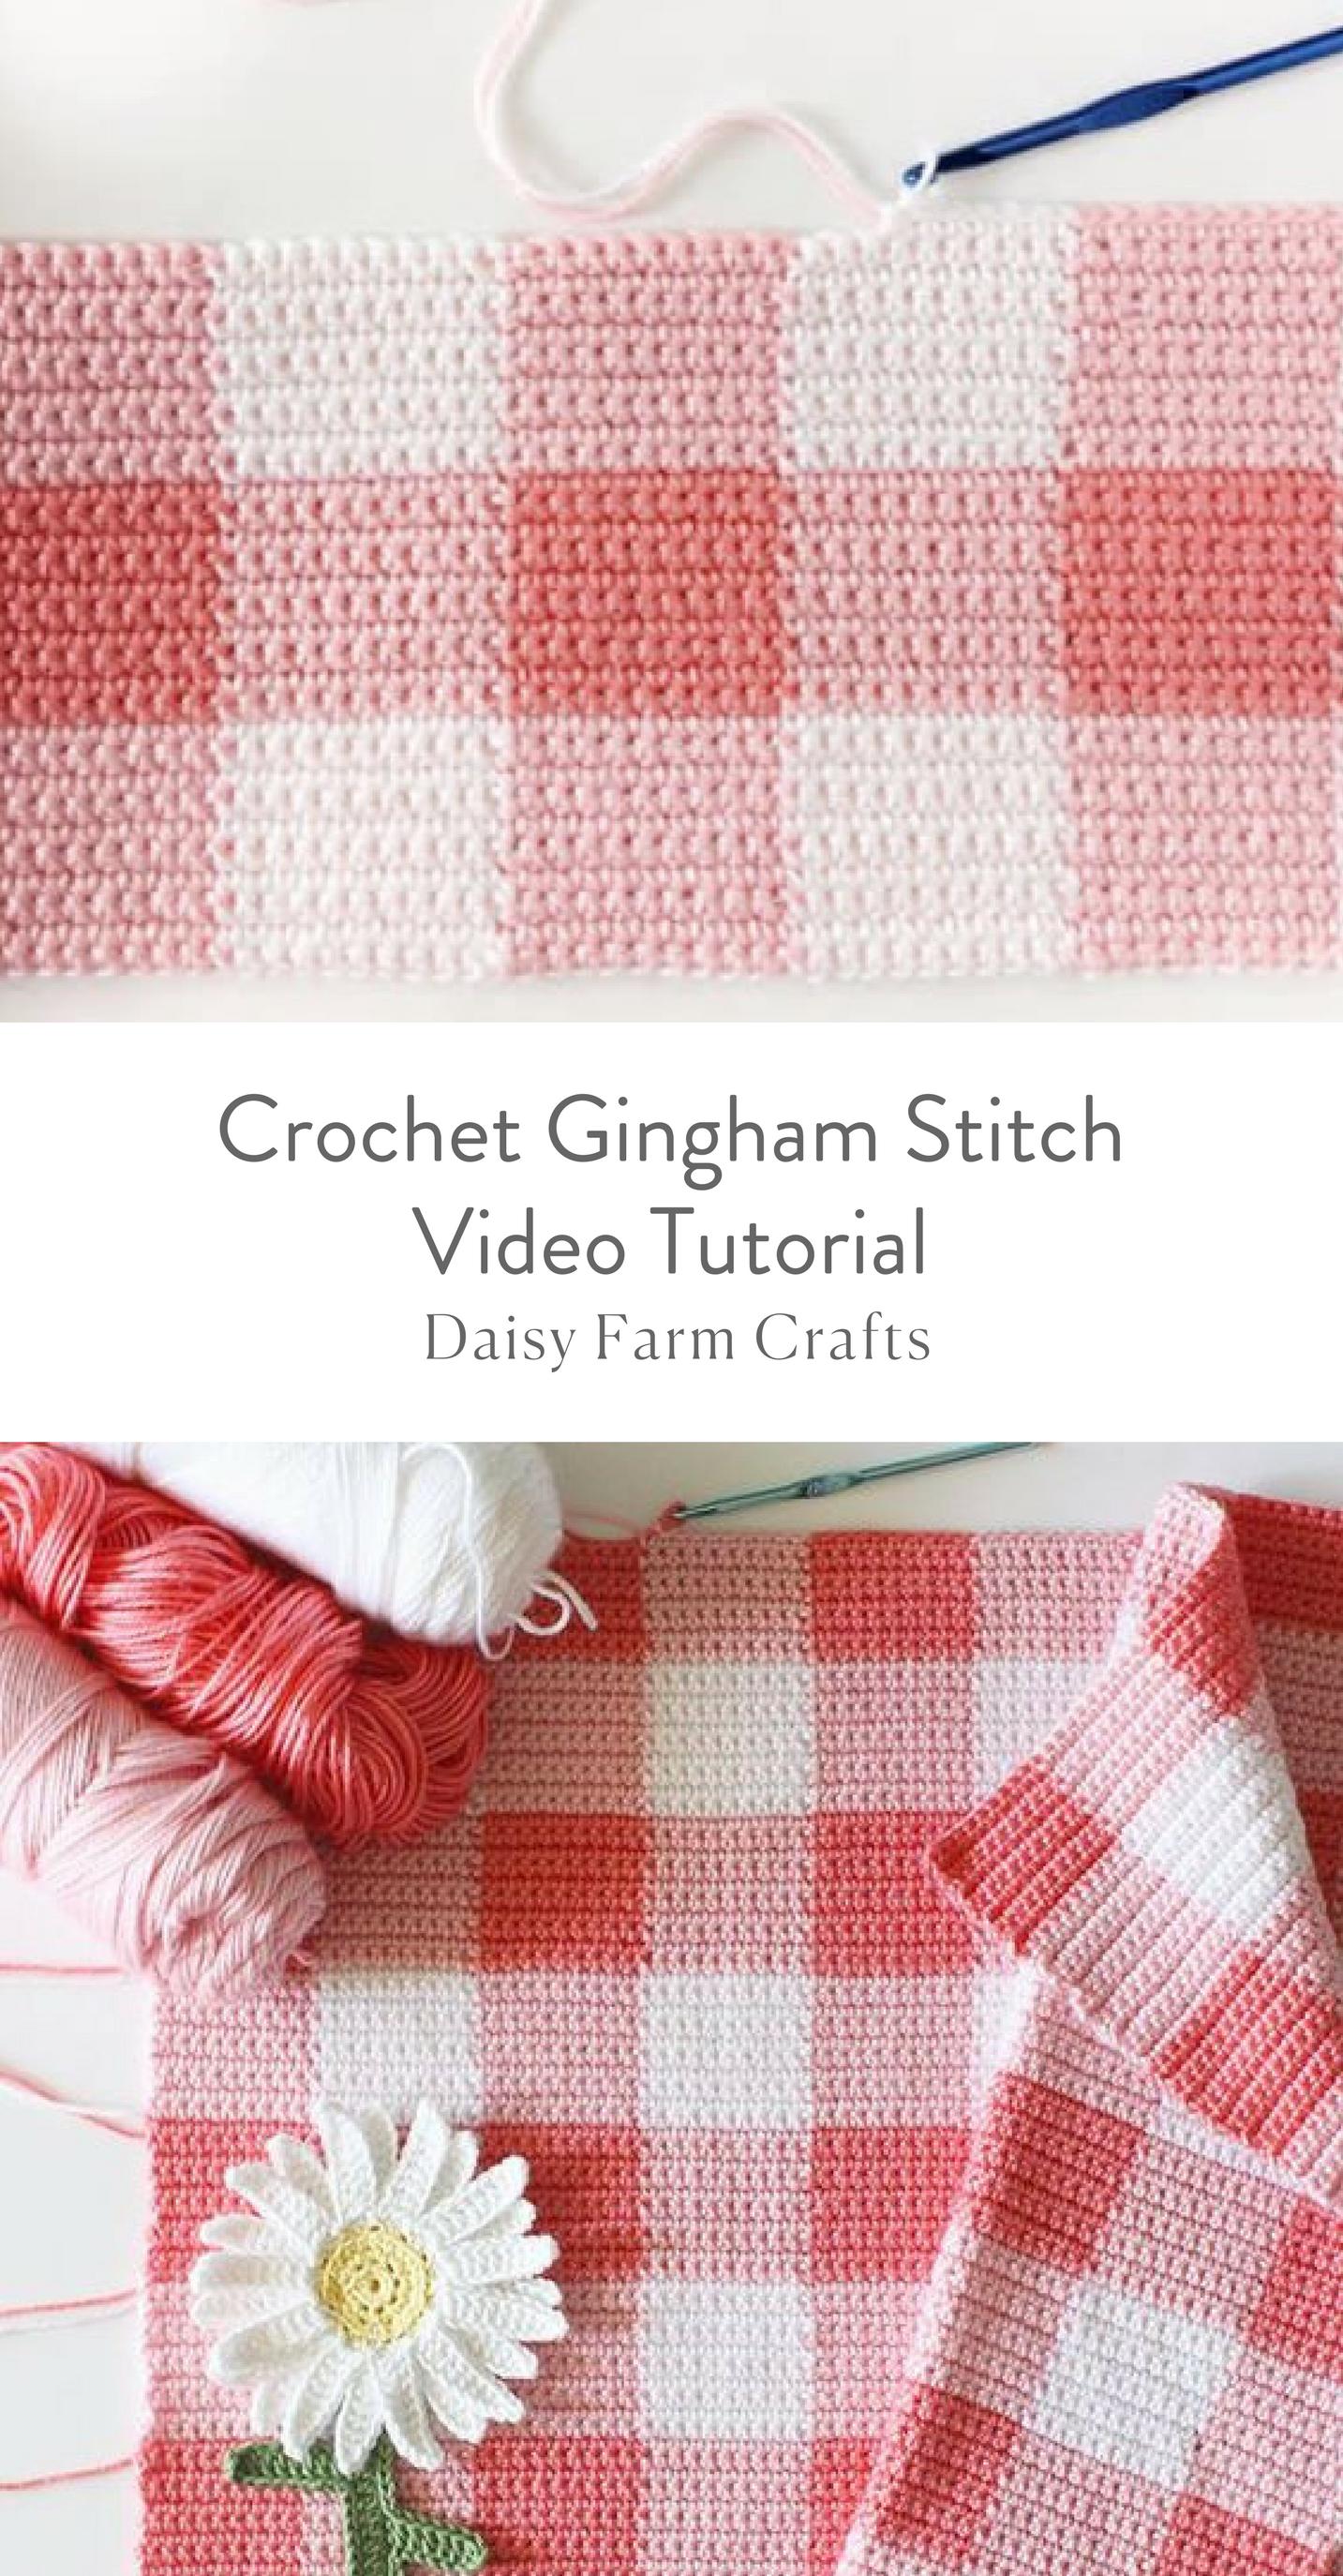 Crochet Gingham Stitch Video Tutorial Crochet Blanket Patterns Crochet Tutorial Crochet For Beginners Blanket